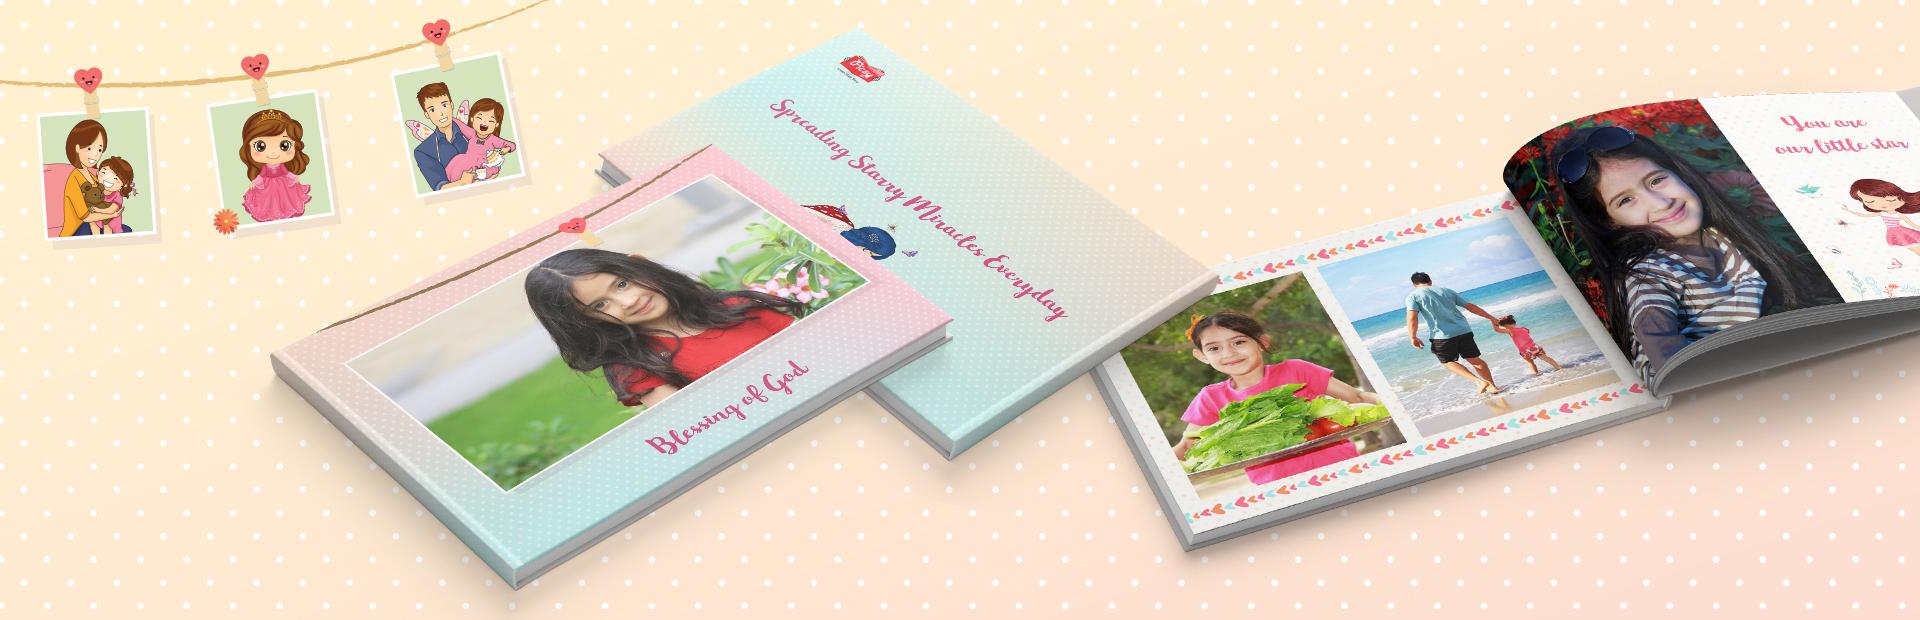 Daughters Delight Custom Photo Books